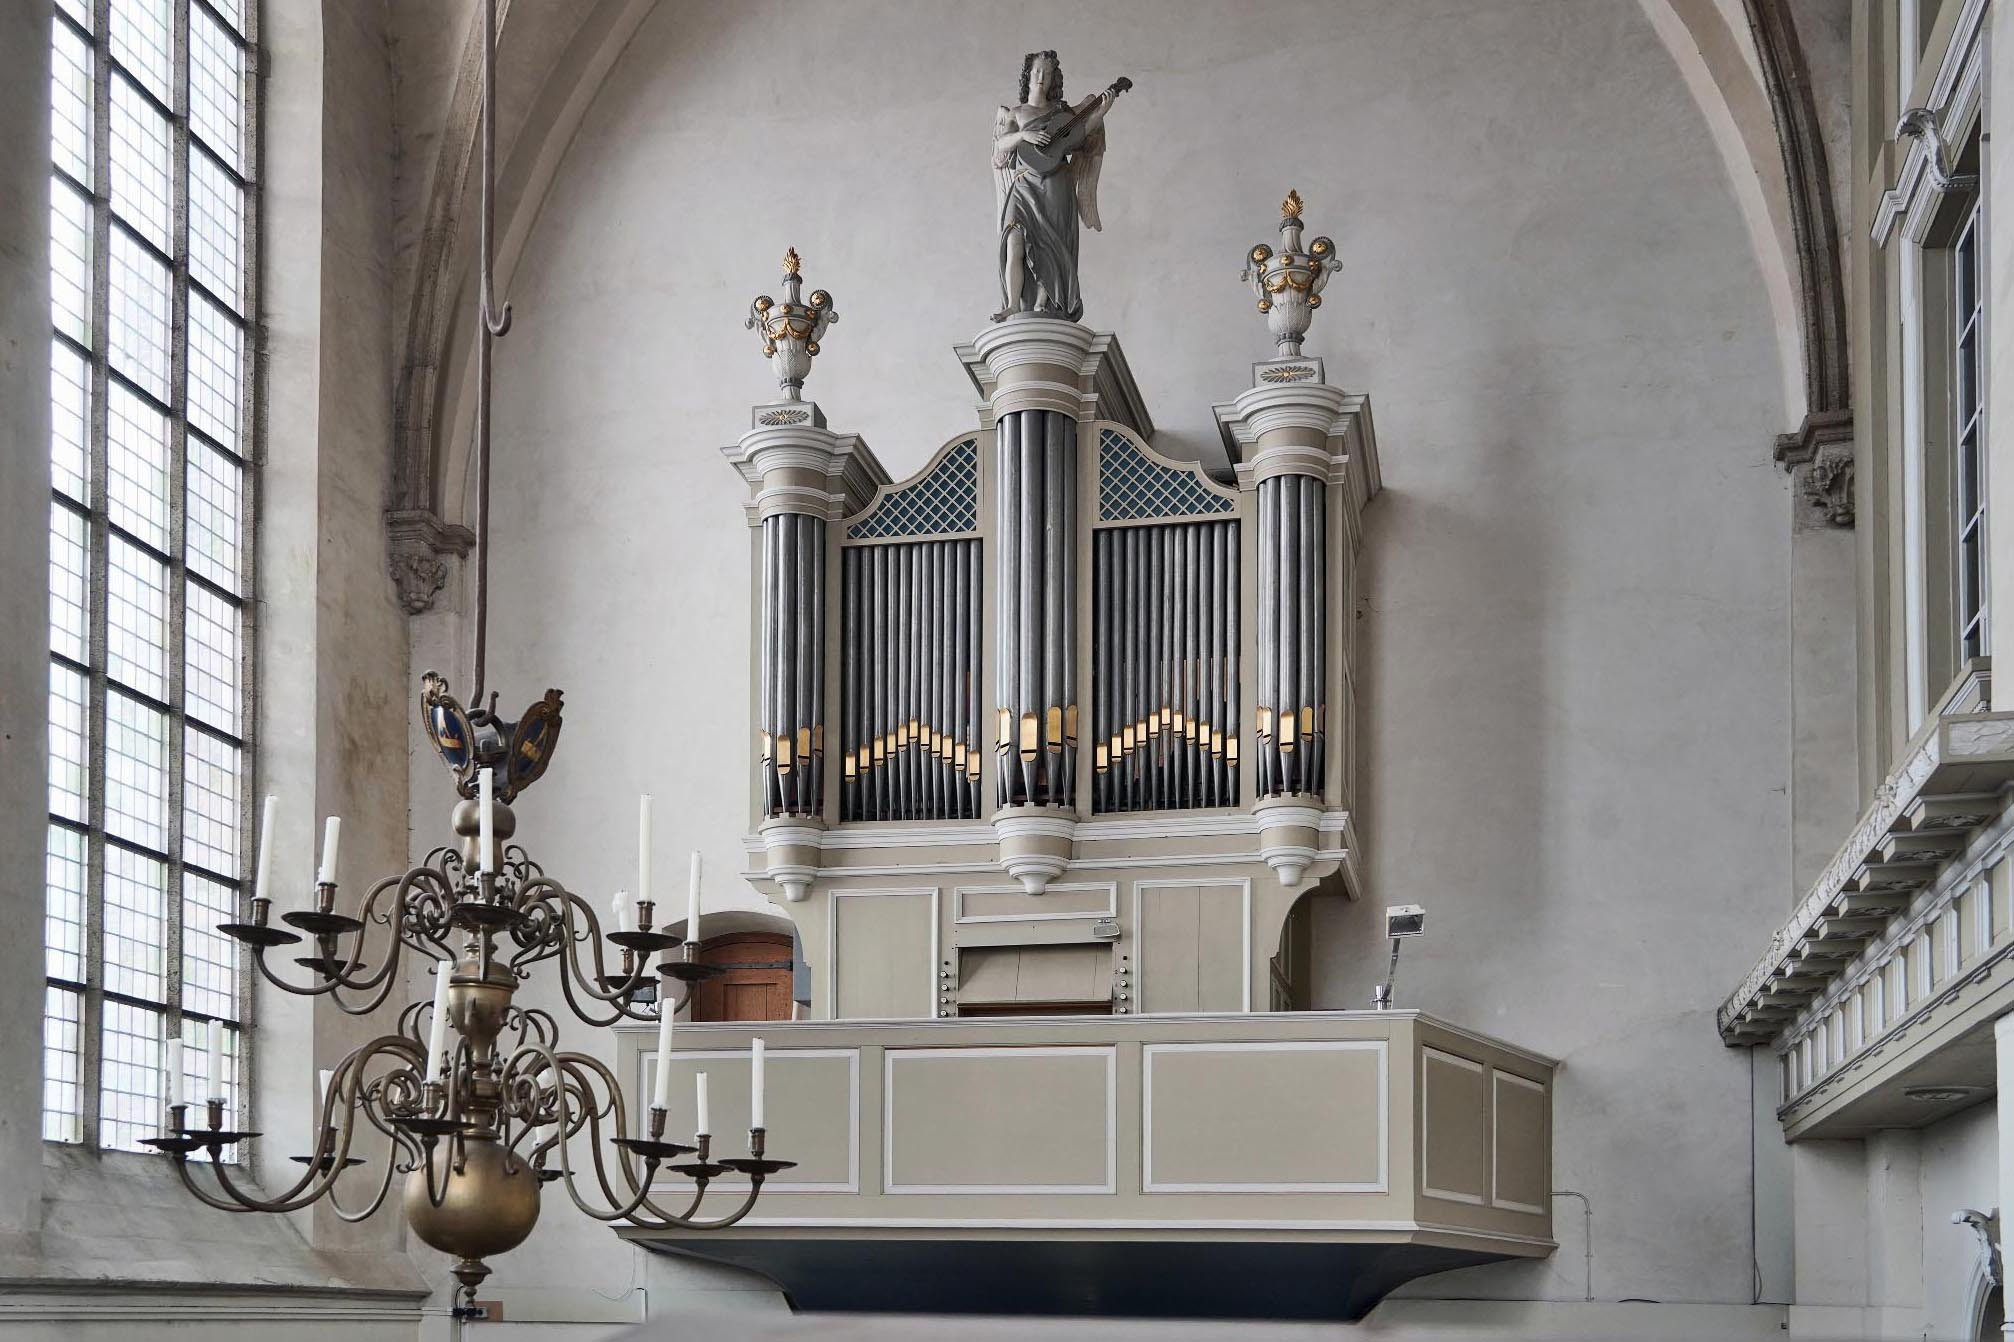 Clerinx-orgel in de Stevenskerk